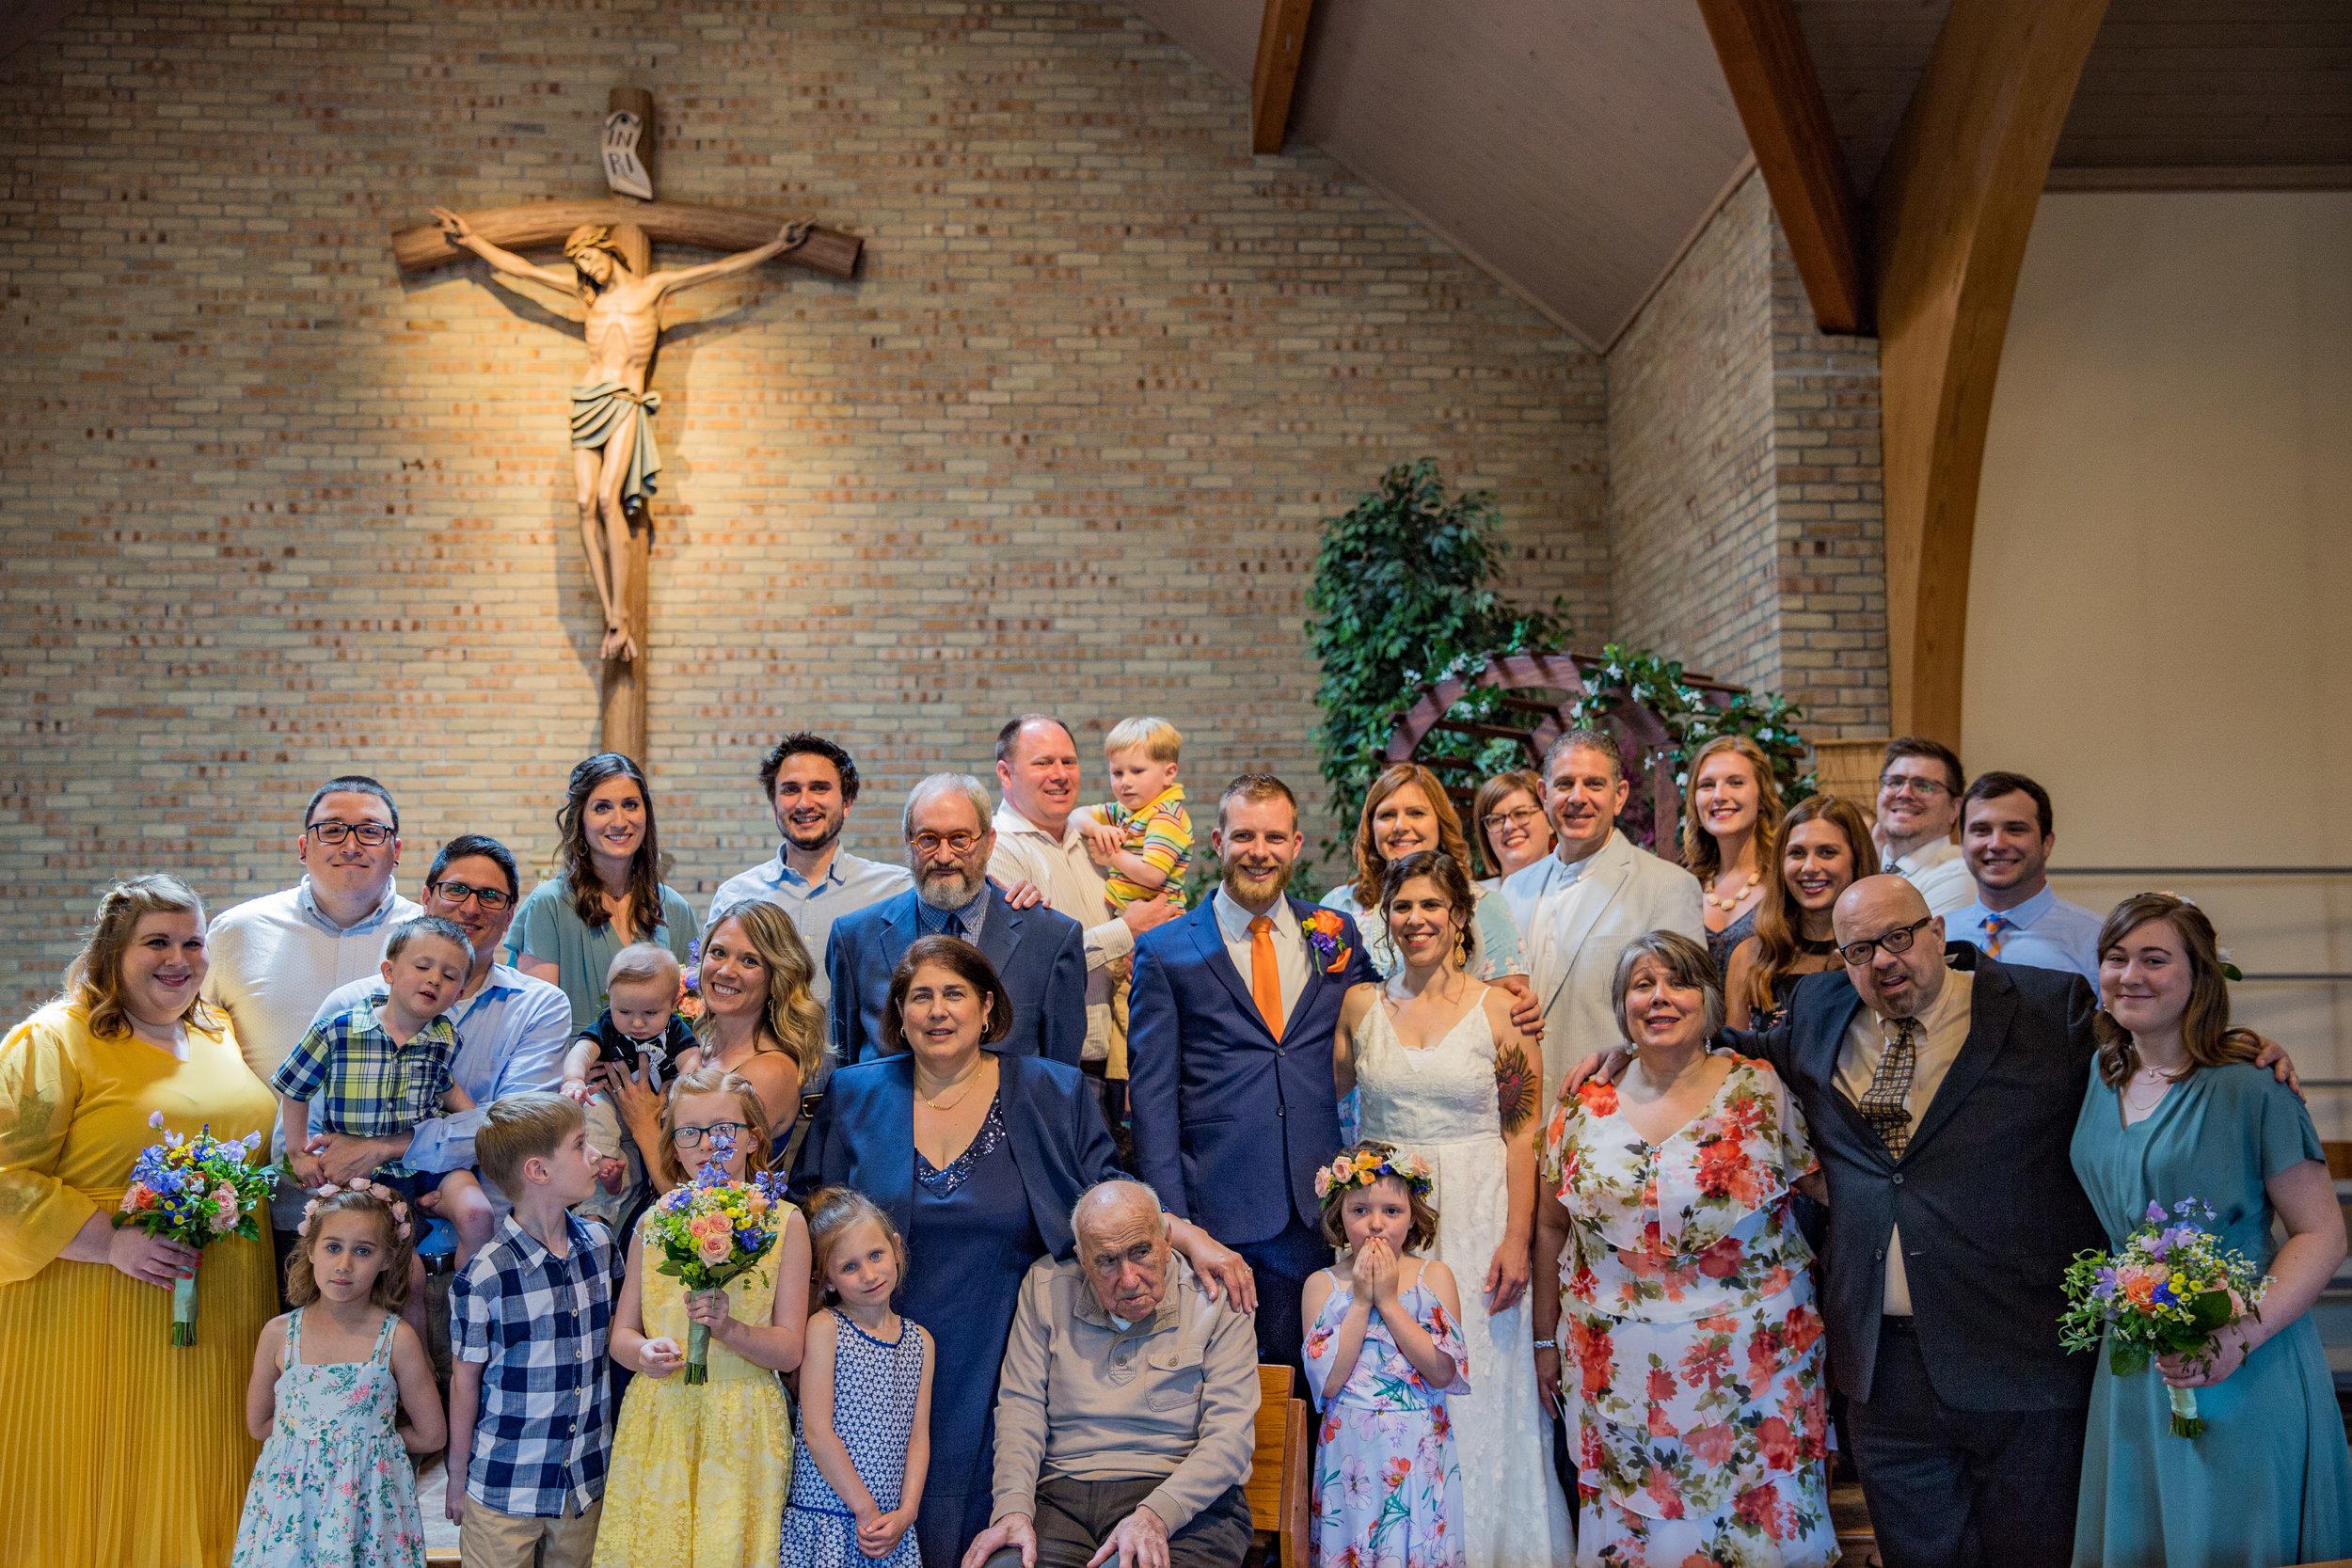 Natalie and Dallas Mooney Wedding 6-8-19_Tania Watt Photography-177.jpg